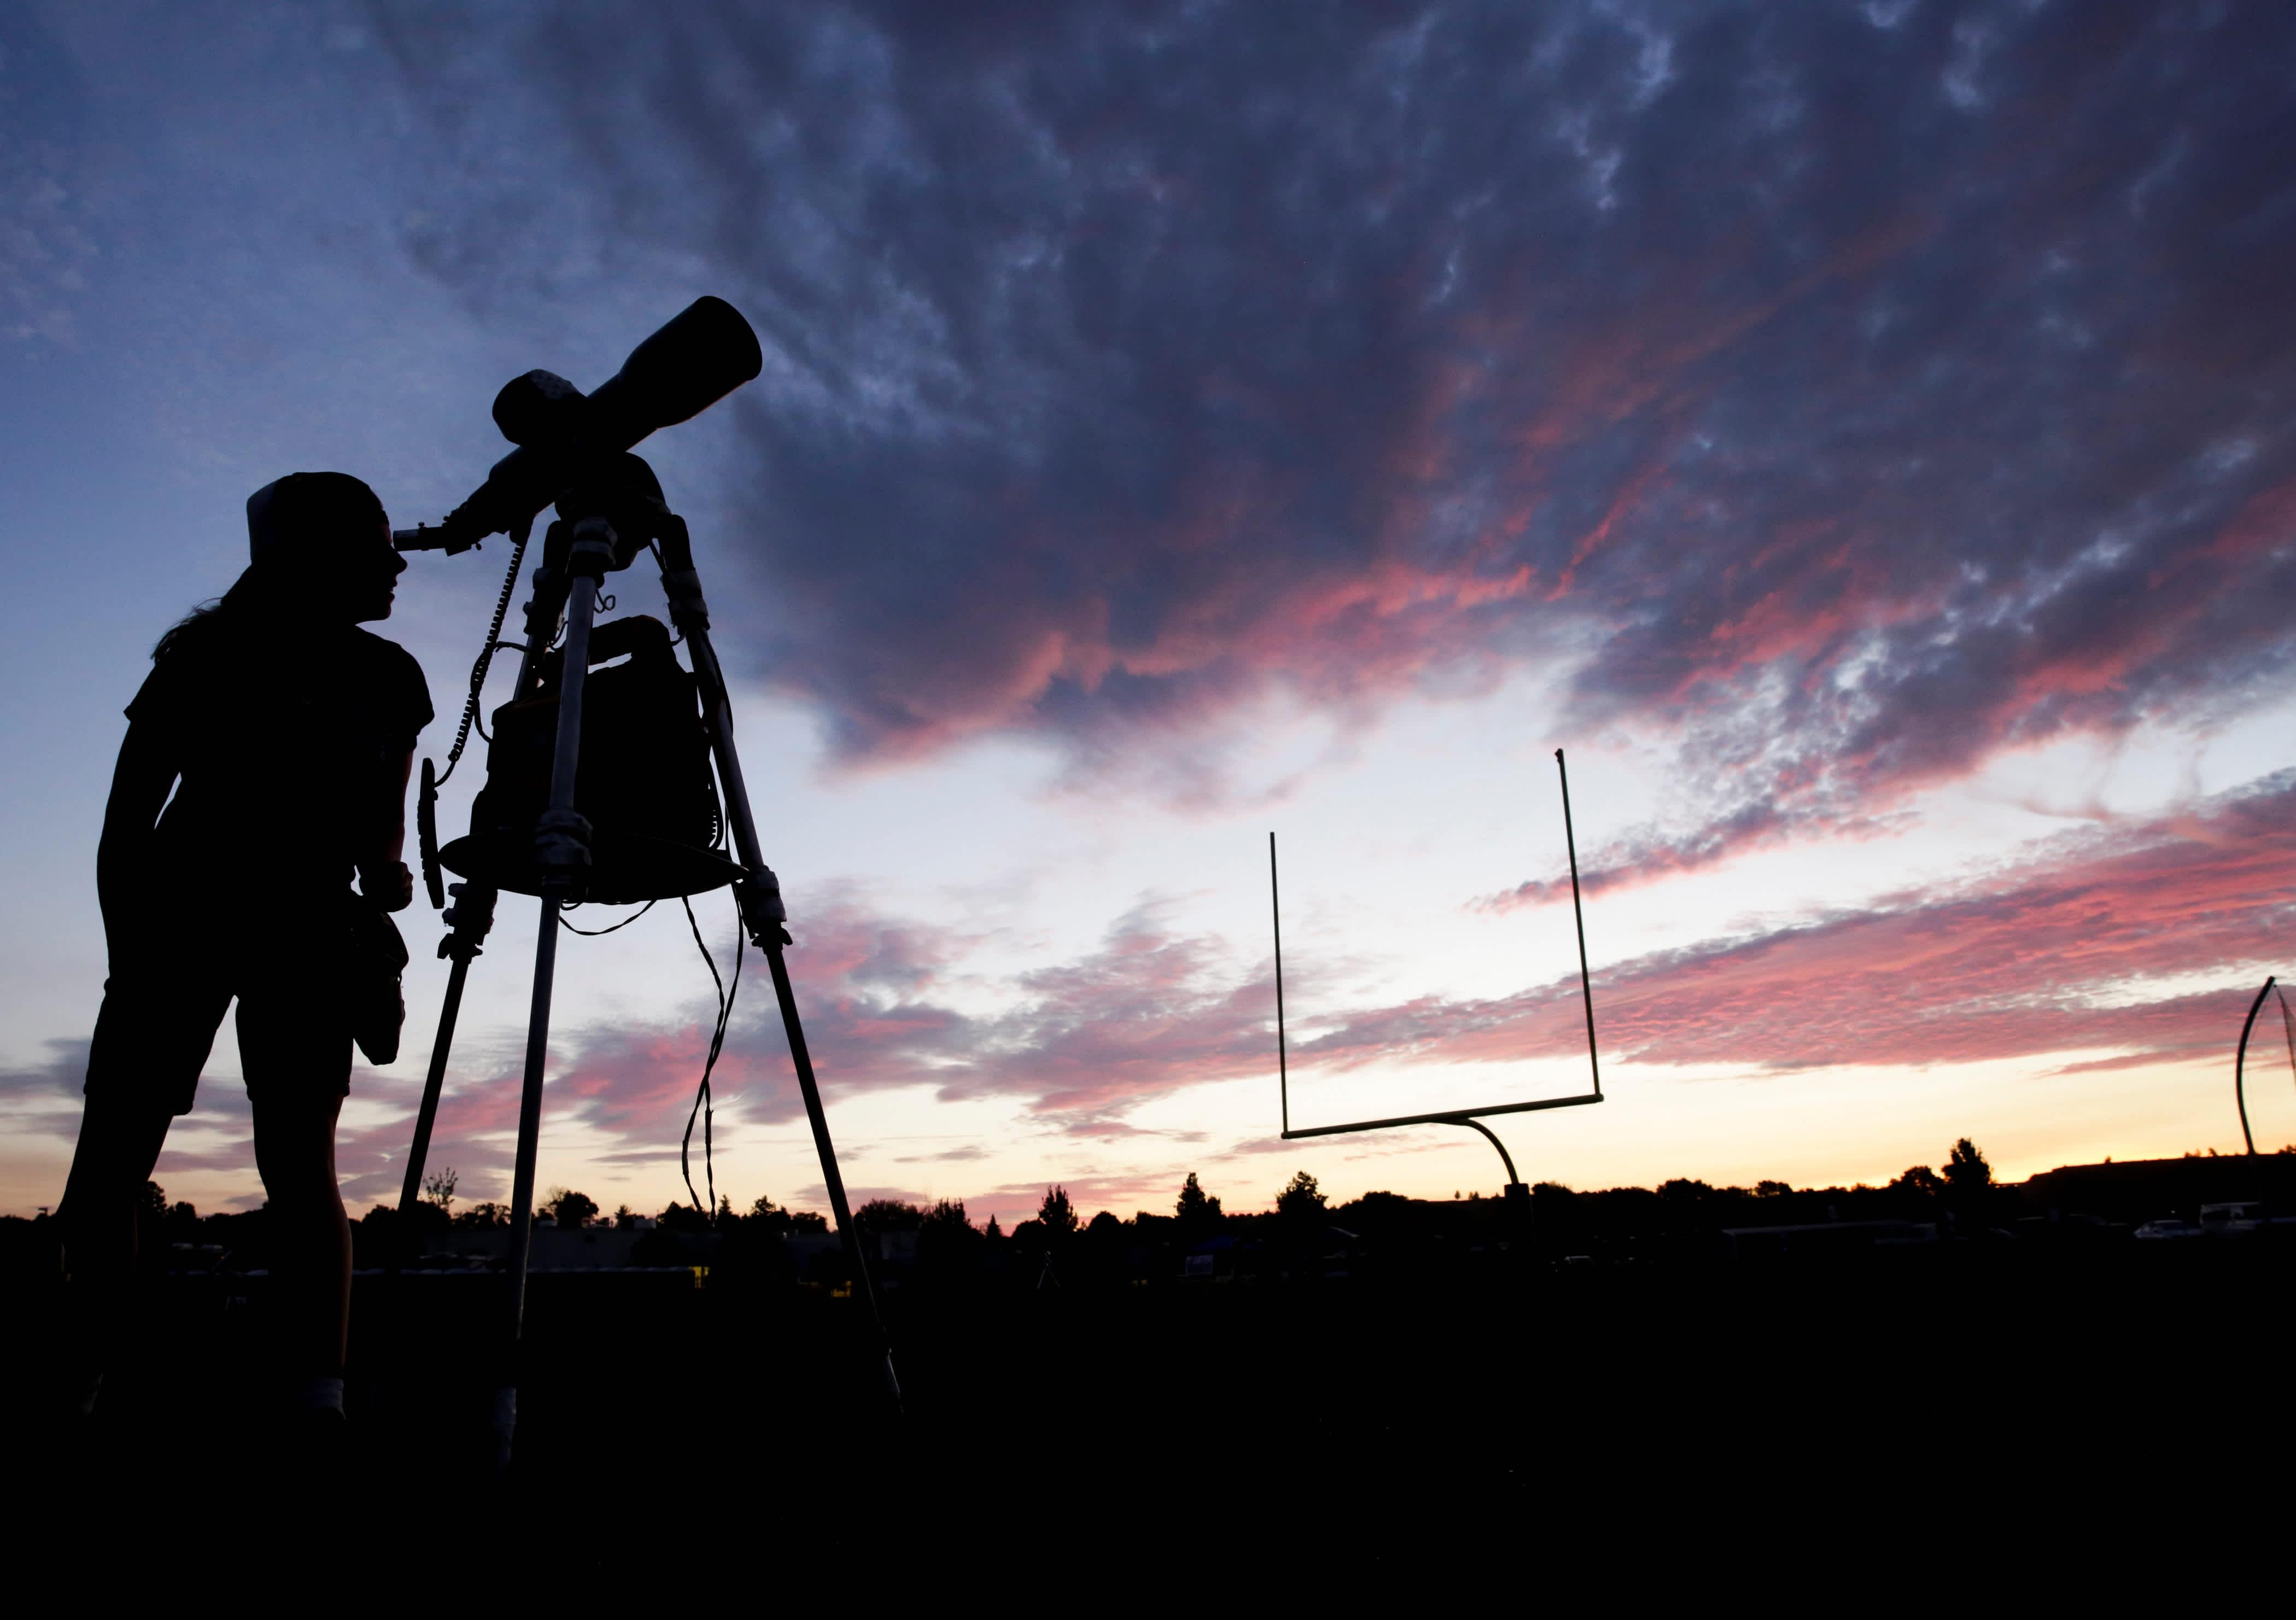 A woman looks through a telescope the evening before a solar eclipse in Oregon, US (Jason Redmond / Reuters)